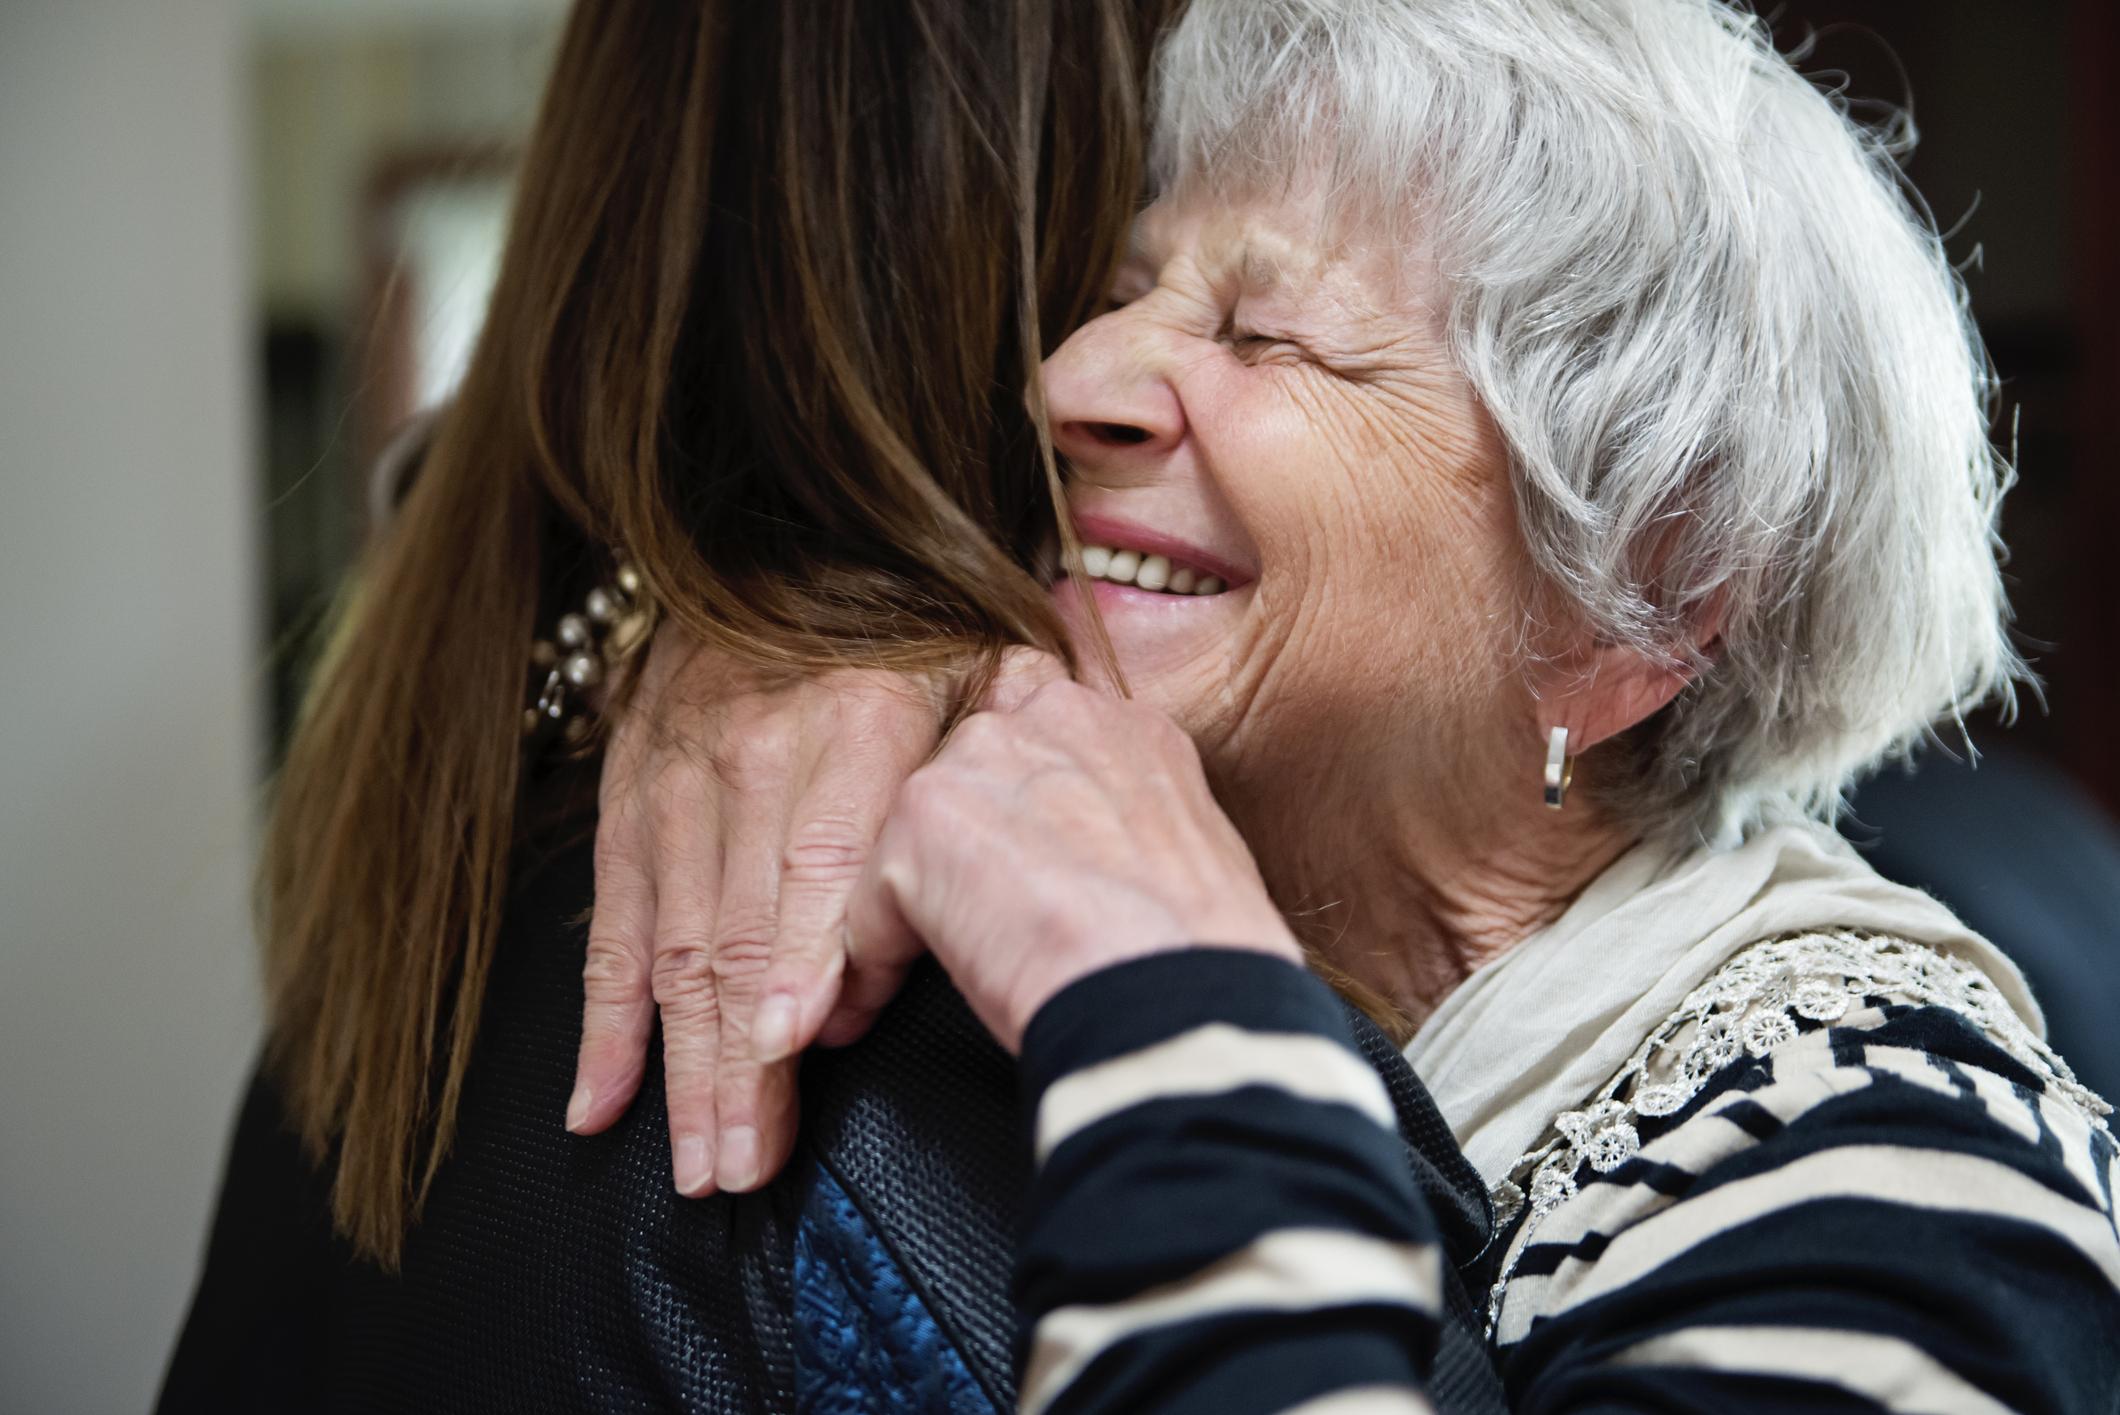 Senior grandmother and adult granddaughter hugging (Getty Images)